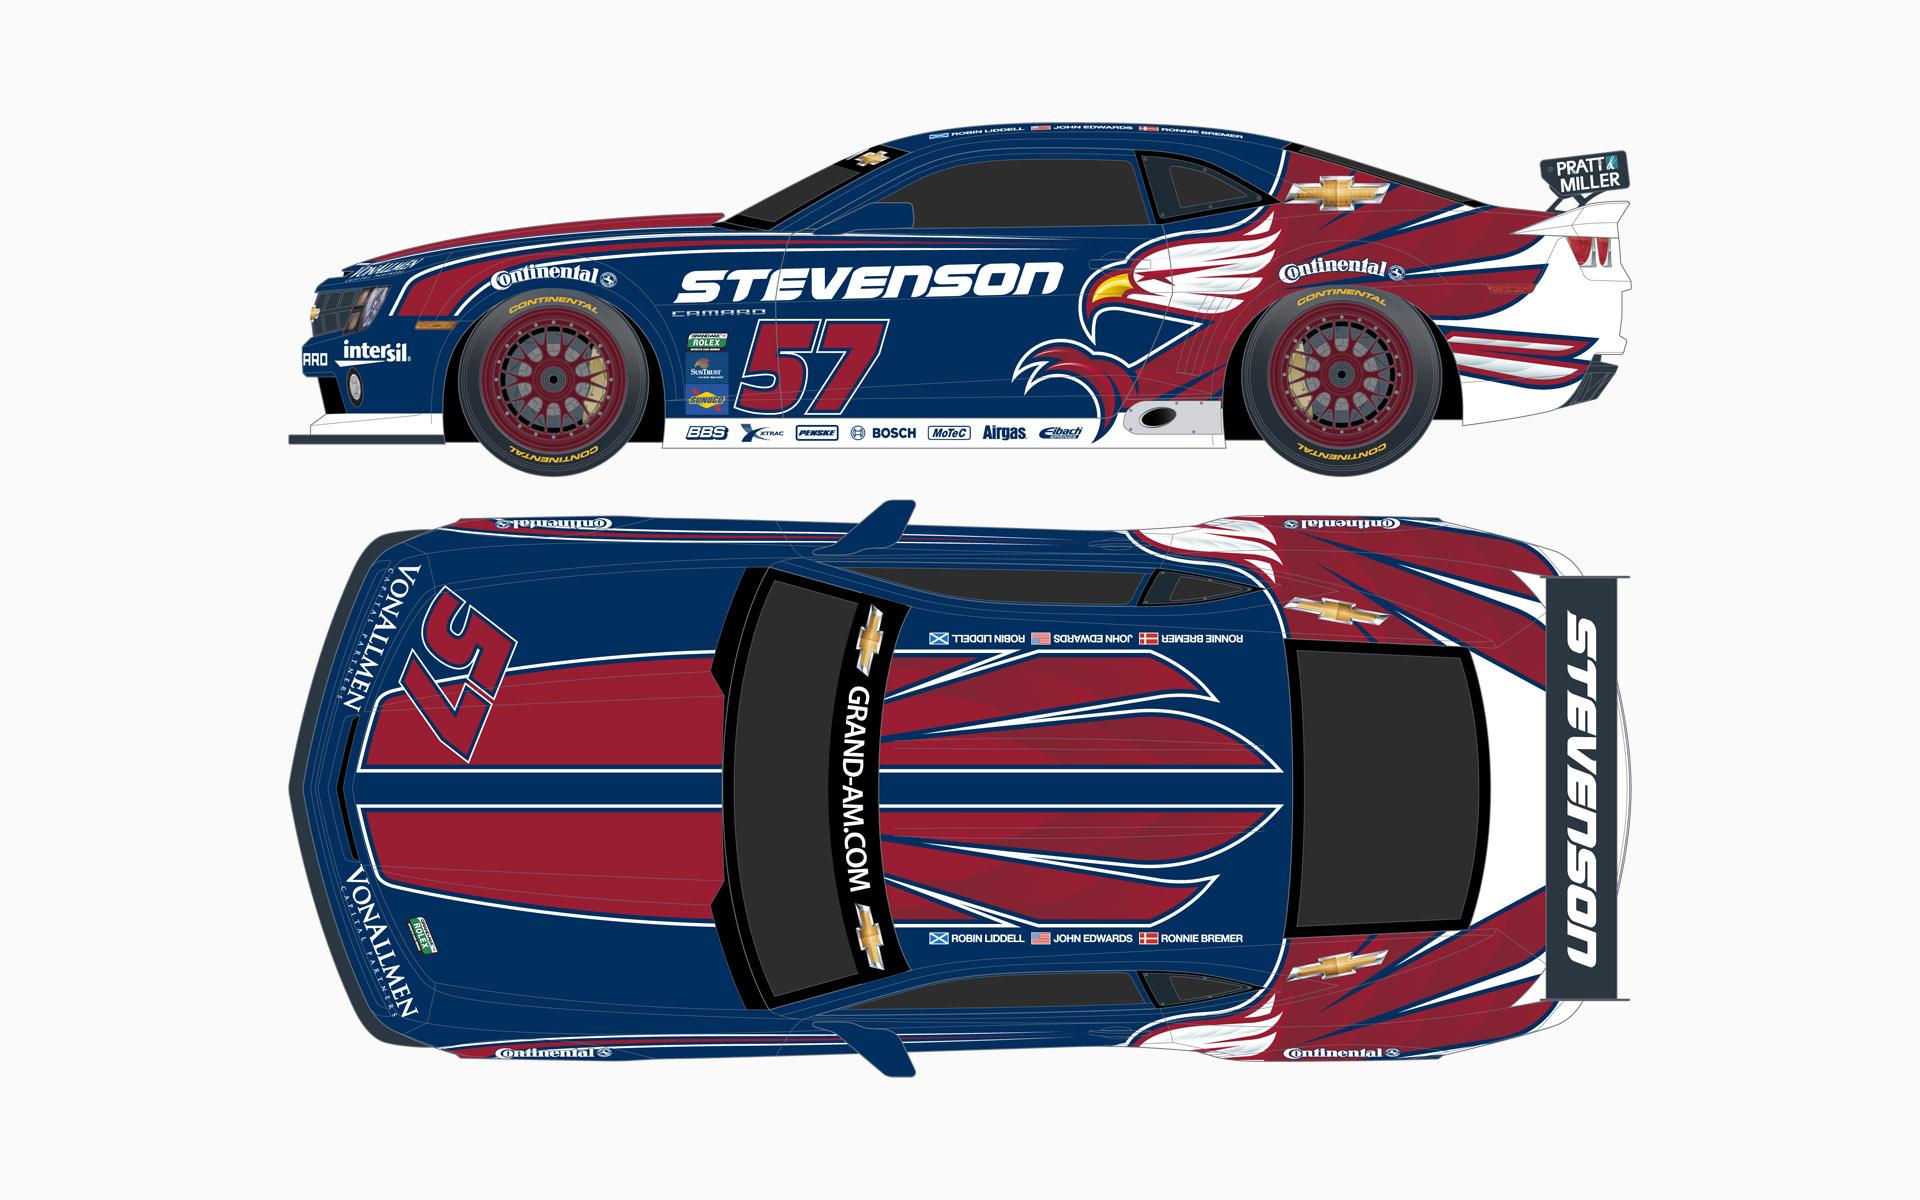 2012 Stevenson Motorsports Chevy Camaro GTR GT Livery Elevations